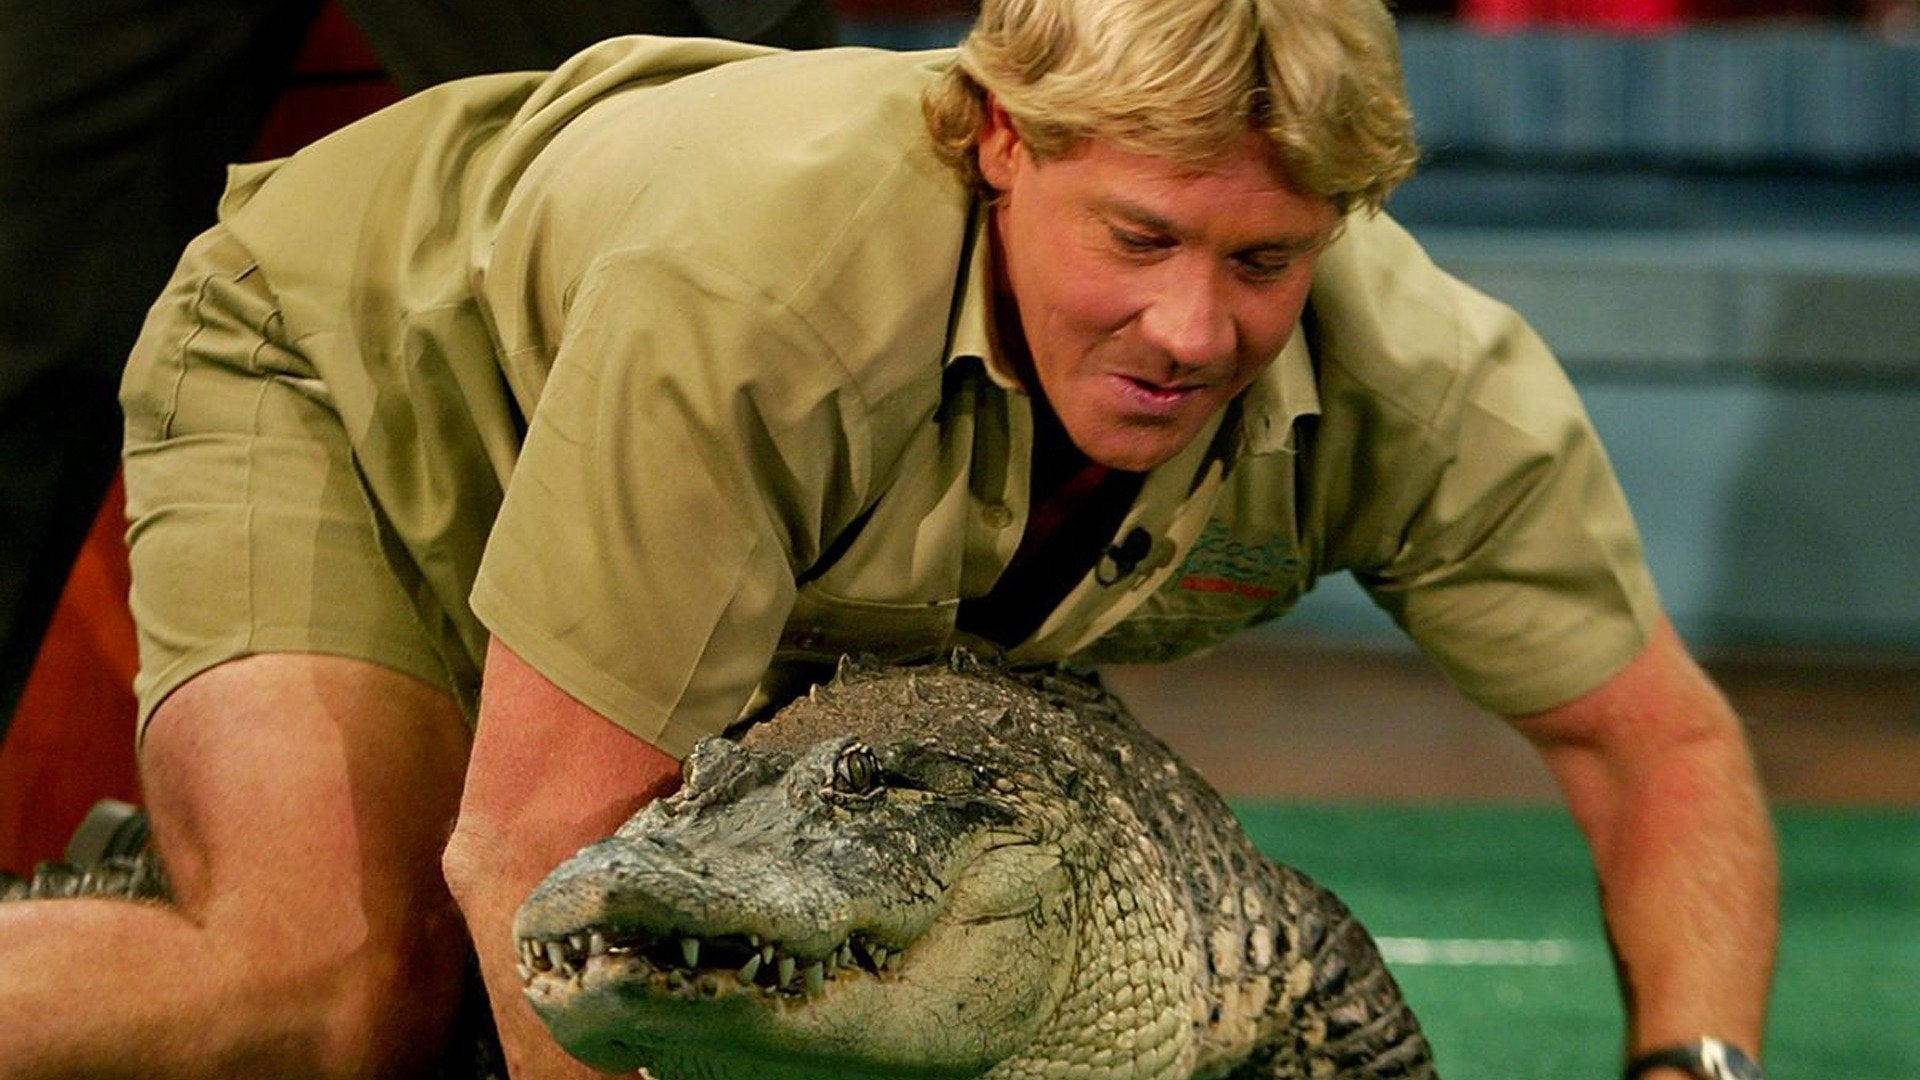 The Crocodile Hunter: Big Croc Diaries Special Edition